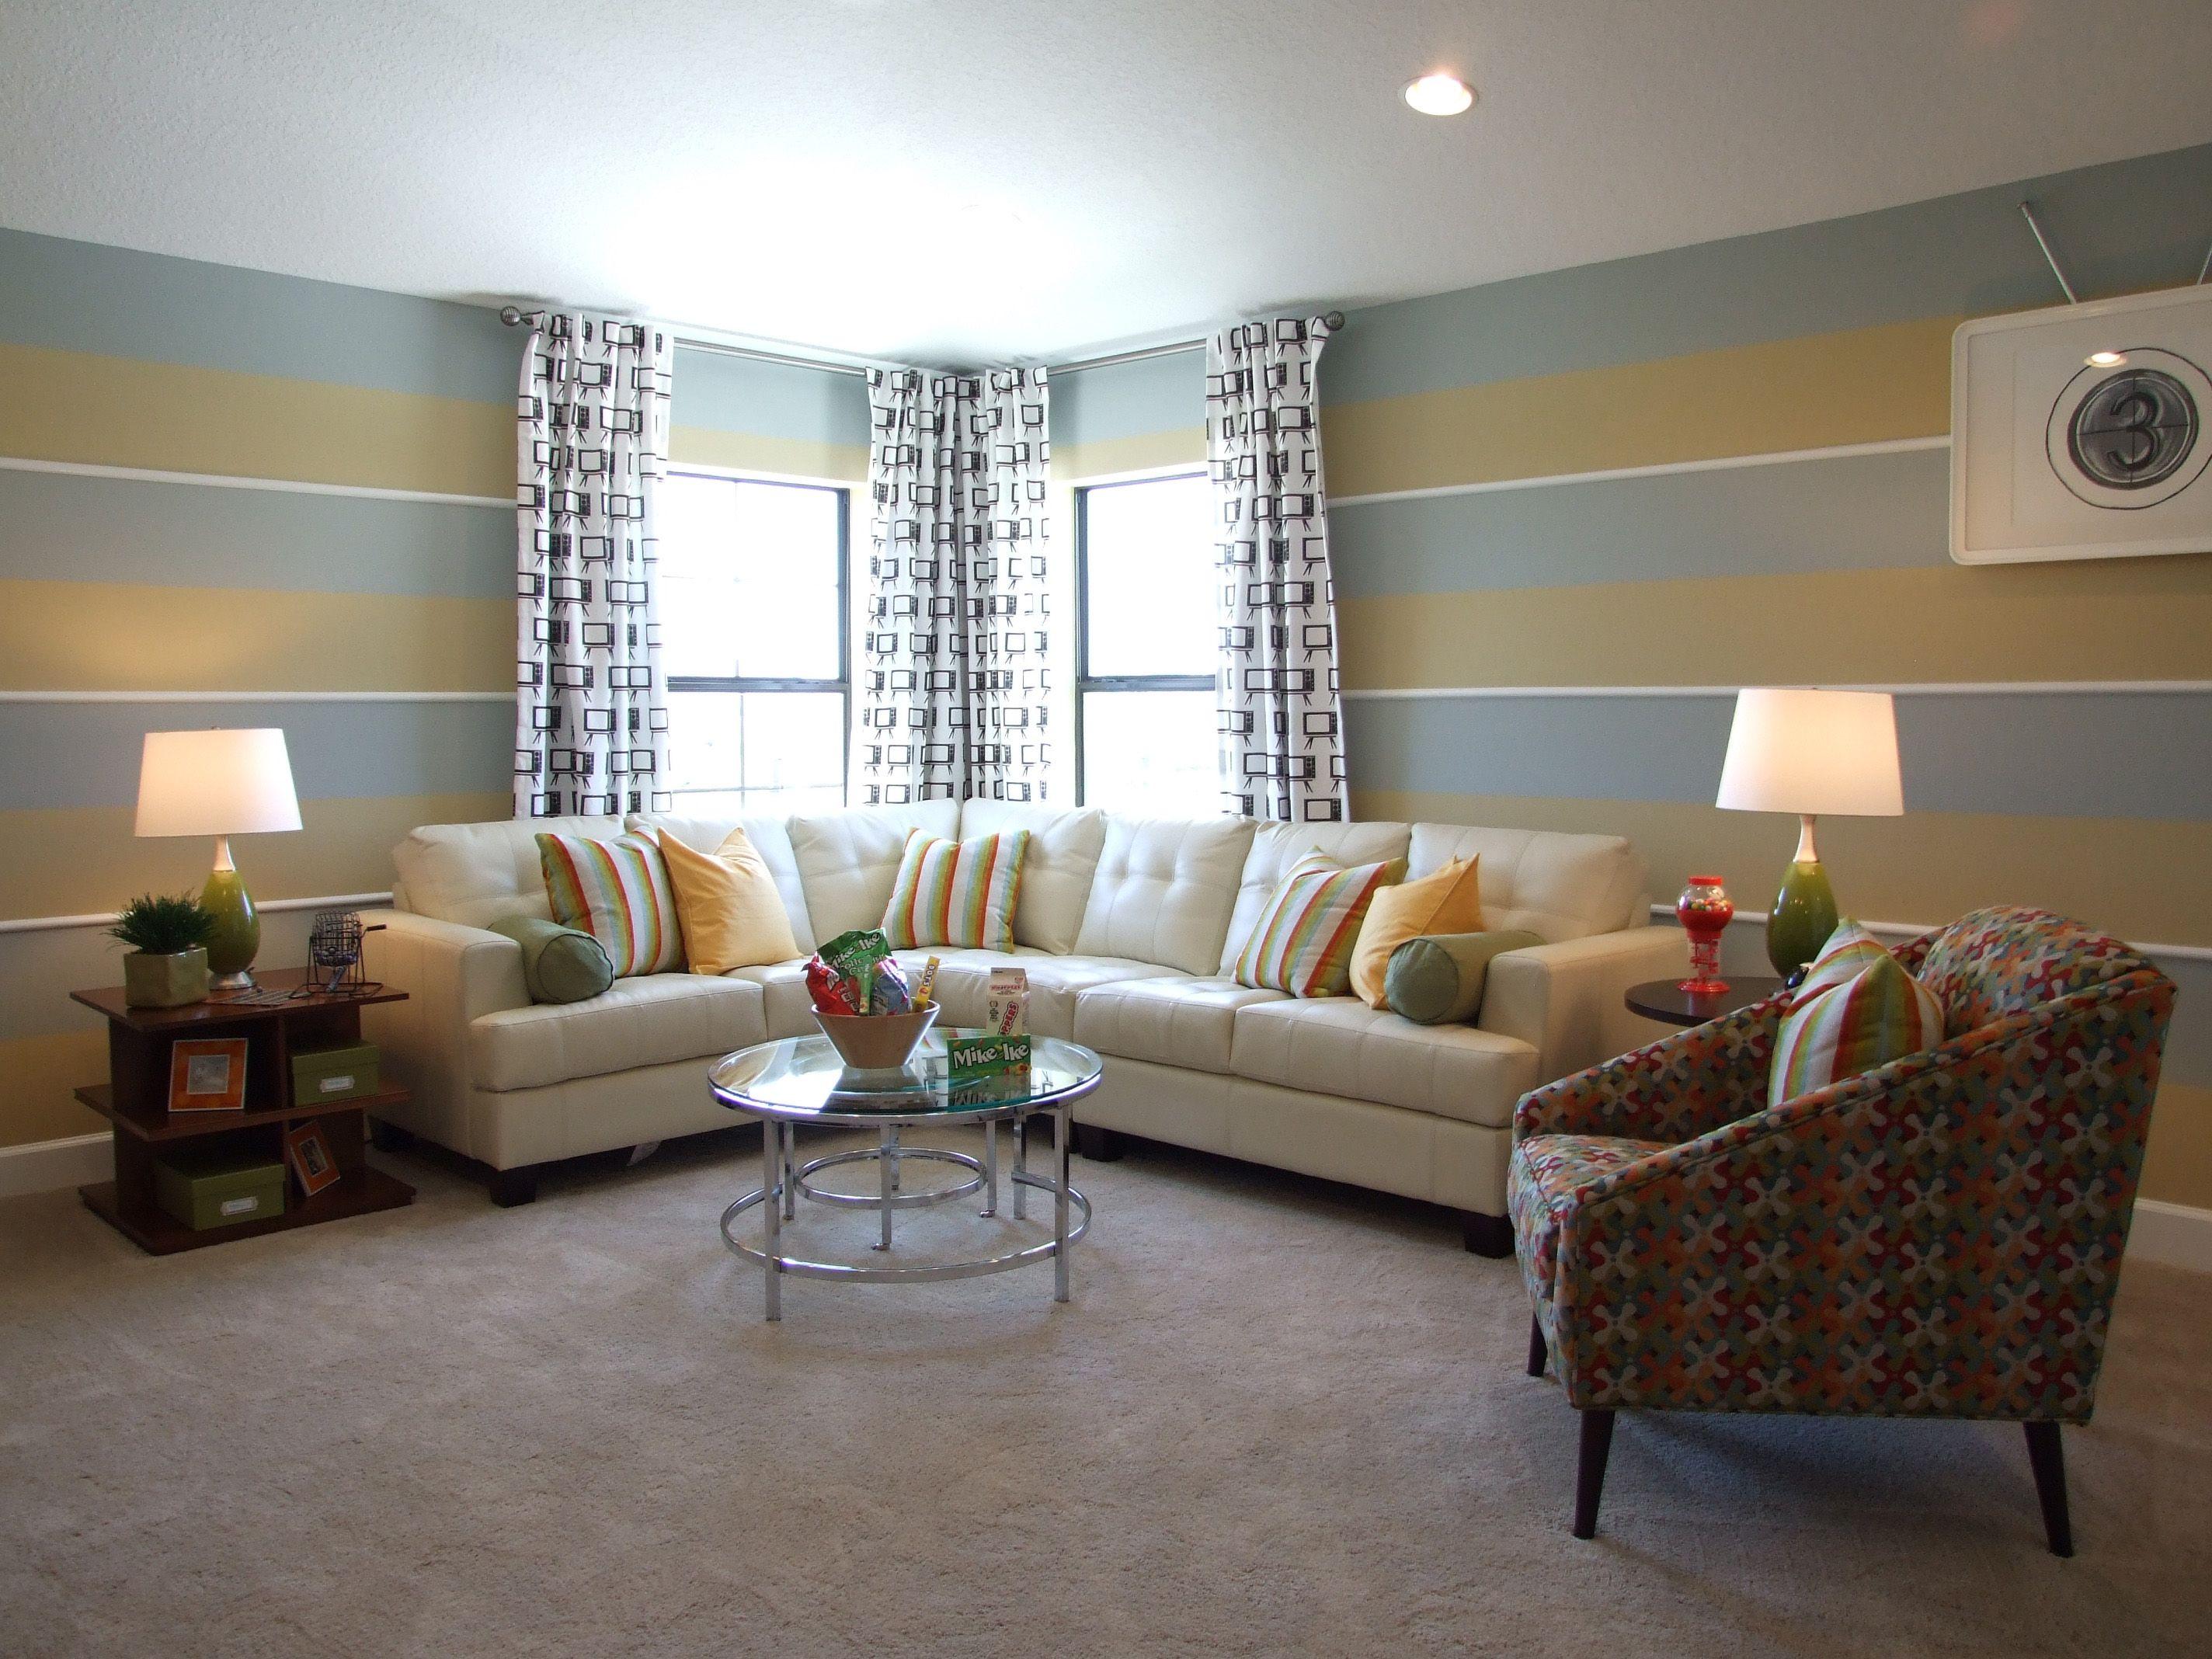 17 Most Popular Bonus Room Ideas, Designs & Styles